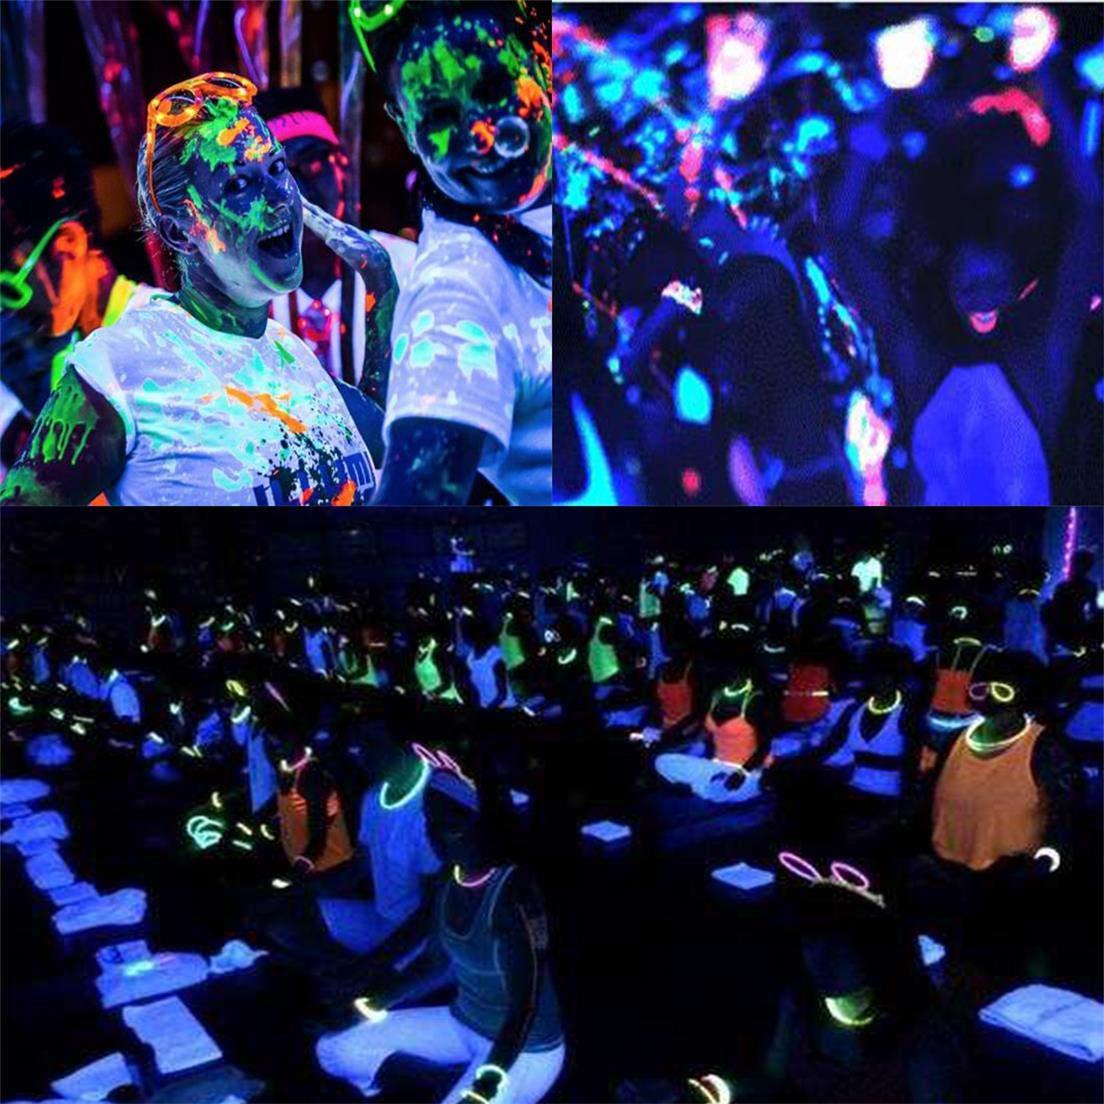 Amars 5m 164ft 3528 Smd Blacklight Uv Ultraviolet 395nm 405nm Led Audio Wiring Plans For Nightclub Light Strip Fixtures Dc 12v 60leds M 300 Purple Bulb Lighting